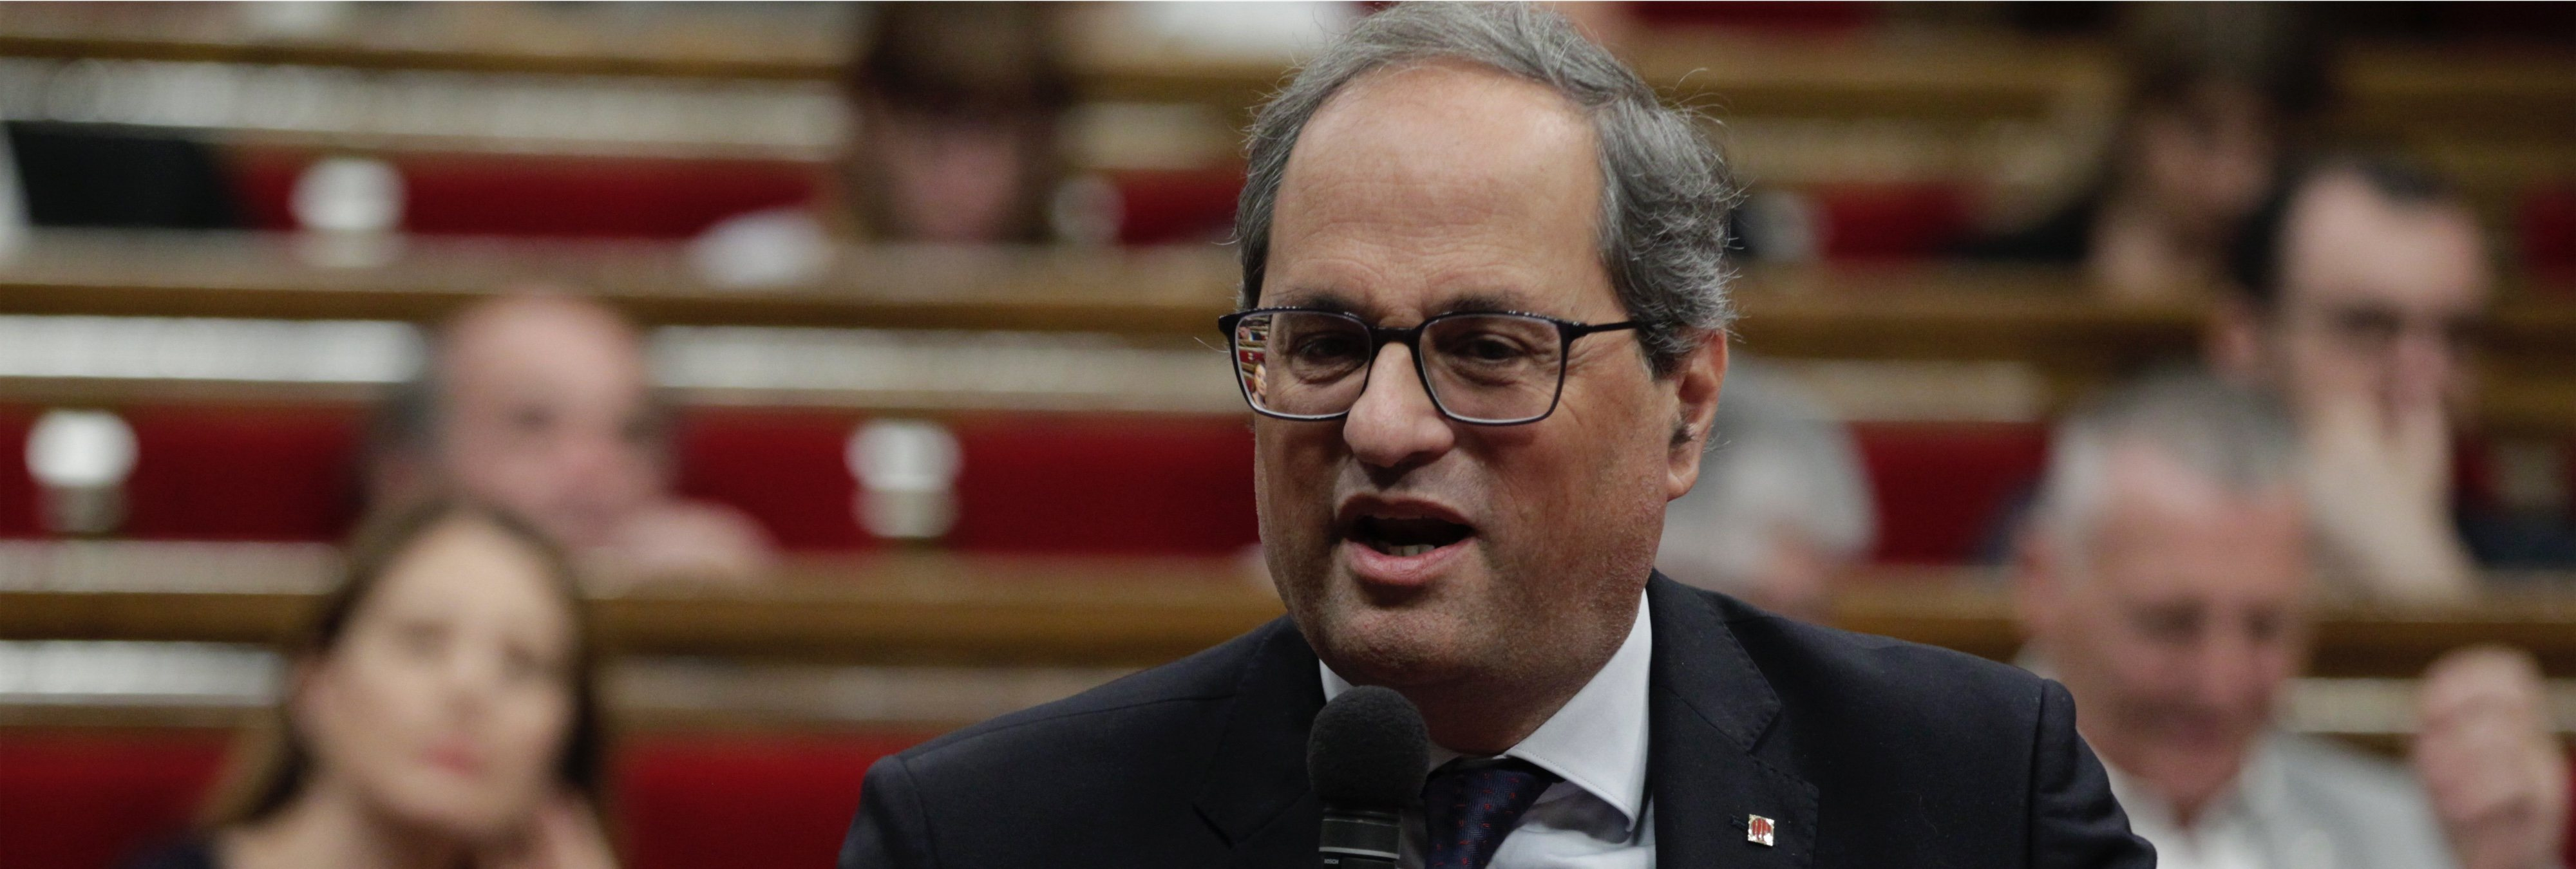 La Generalitat deja de financiar la vacuna del papiloma a personas homosexuales